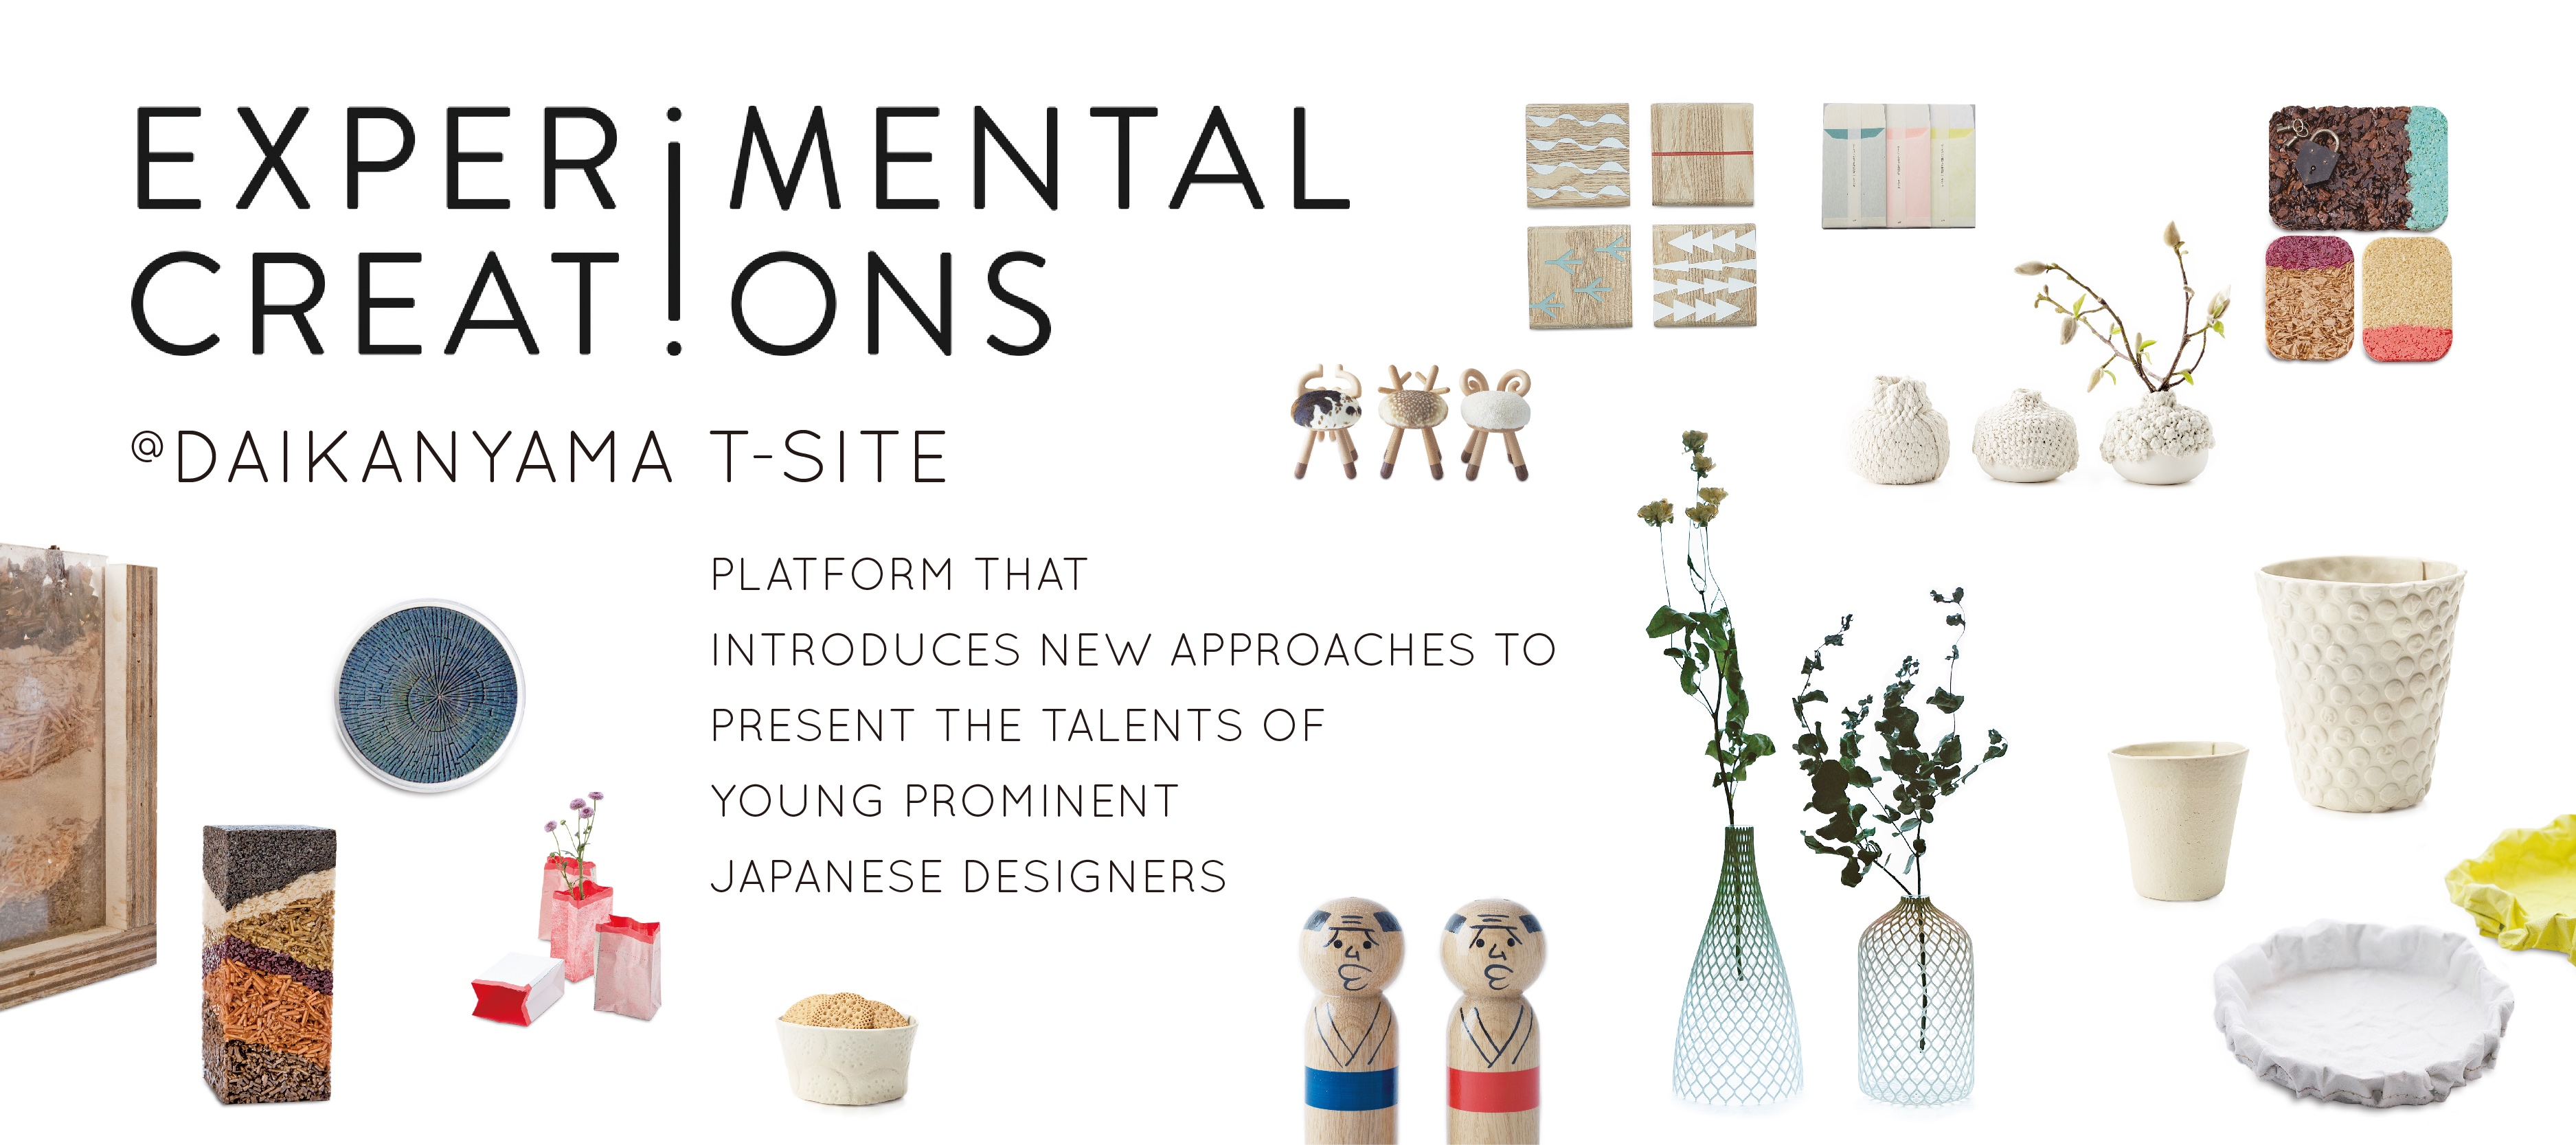 <a href='https://experimental-creations.com/ja/pop-up-store-at-daikanyama-tsite/'></a>